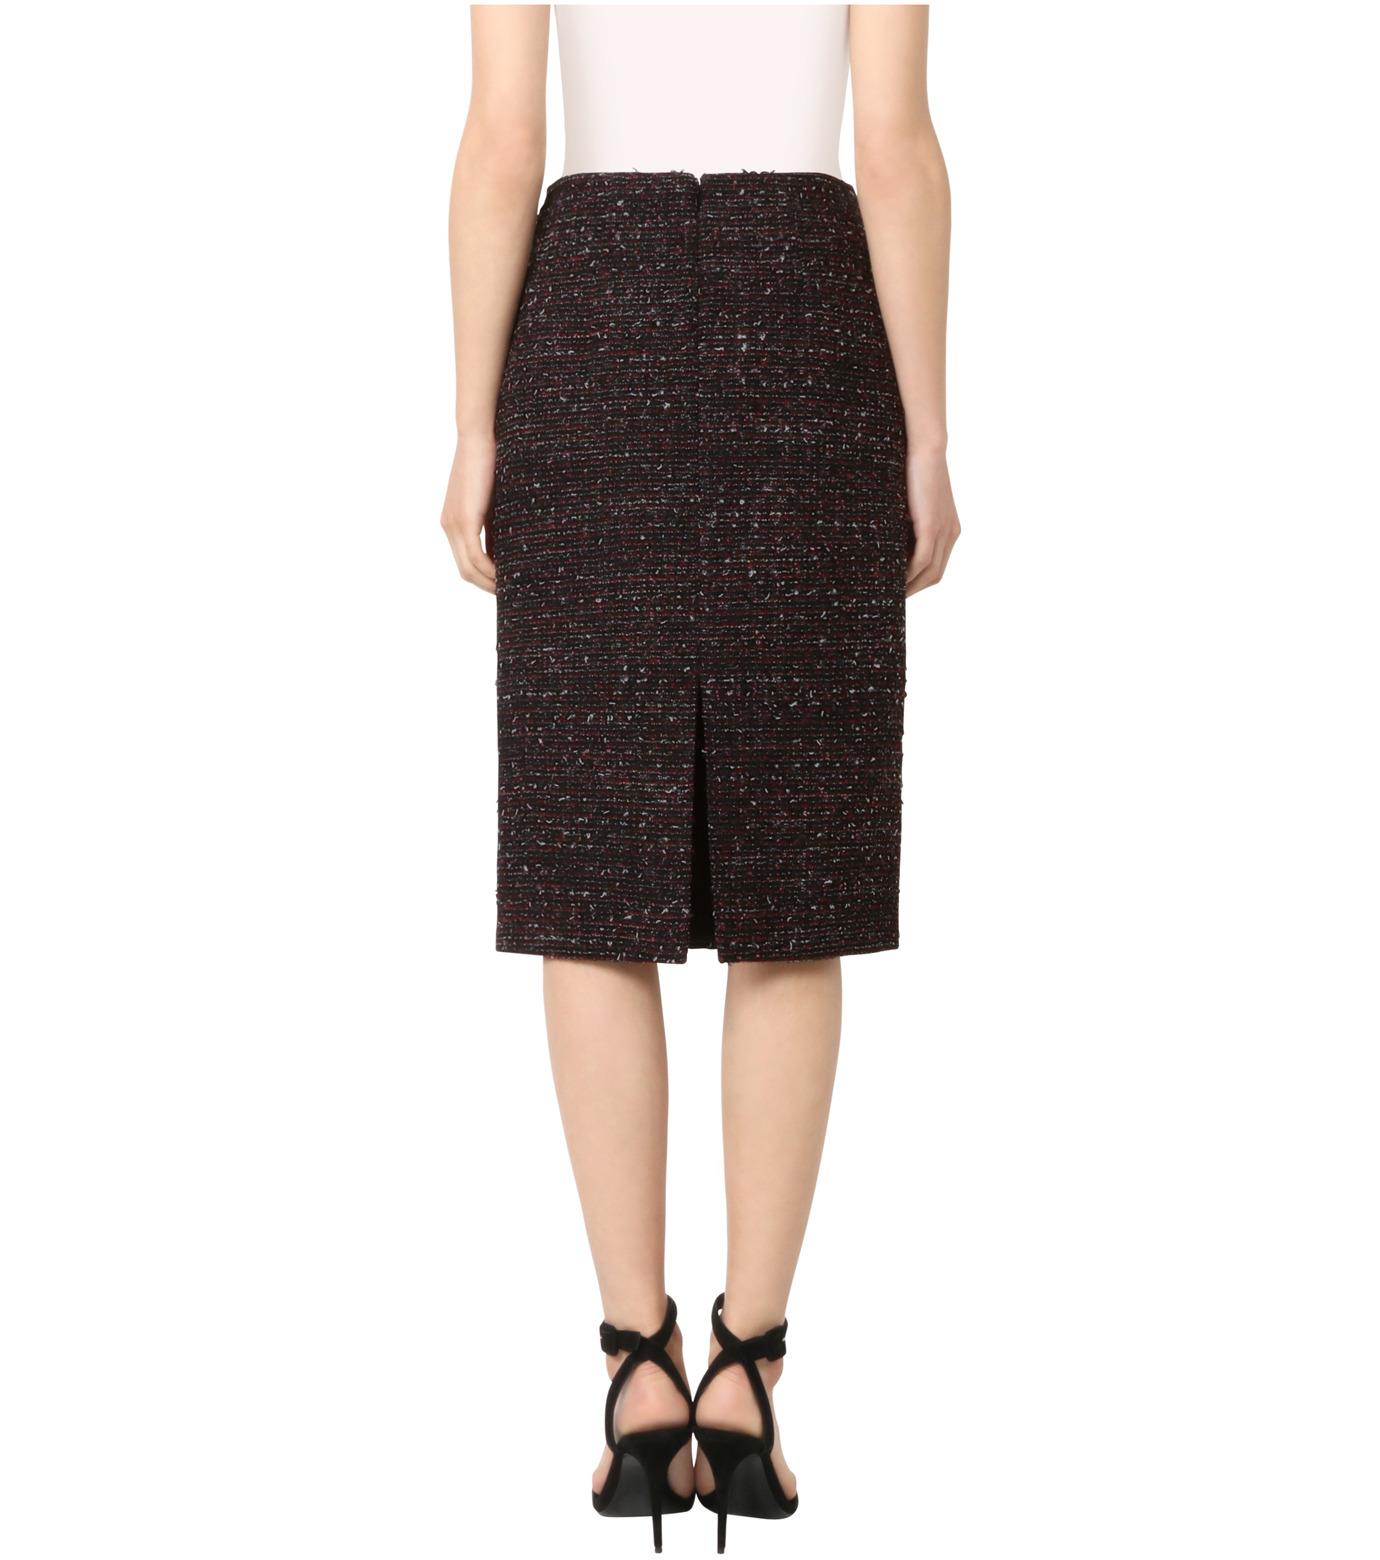 Altuzarra(アルトゥザラ)のTweed Pencil Skirt-BLACK(スカート/skirt)-316-501-465-13 拡大詳細画像2